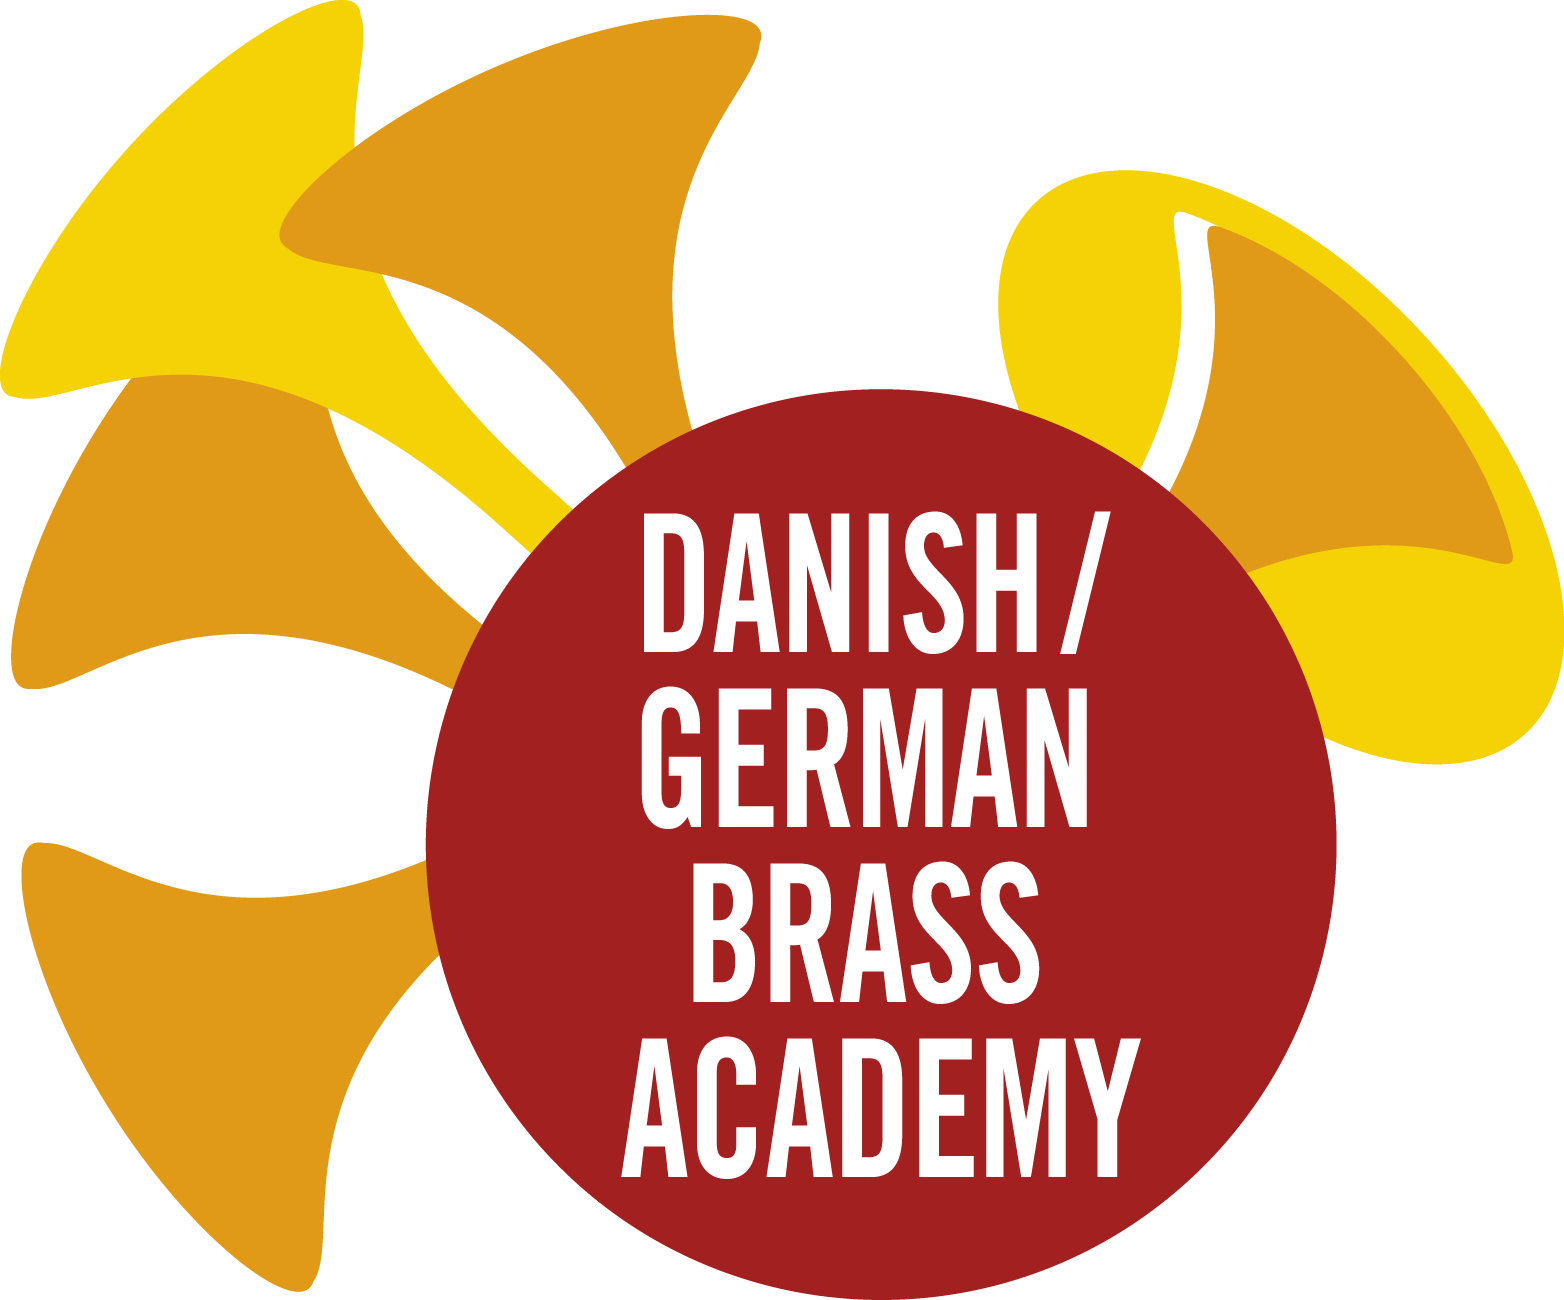 Logo Danish/German Brass Academy